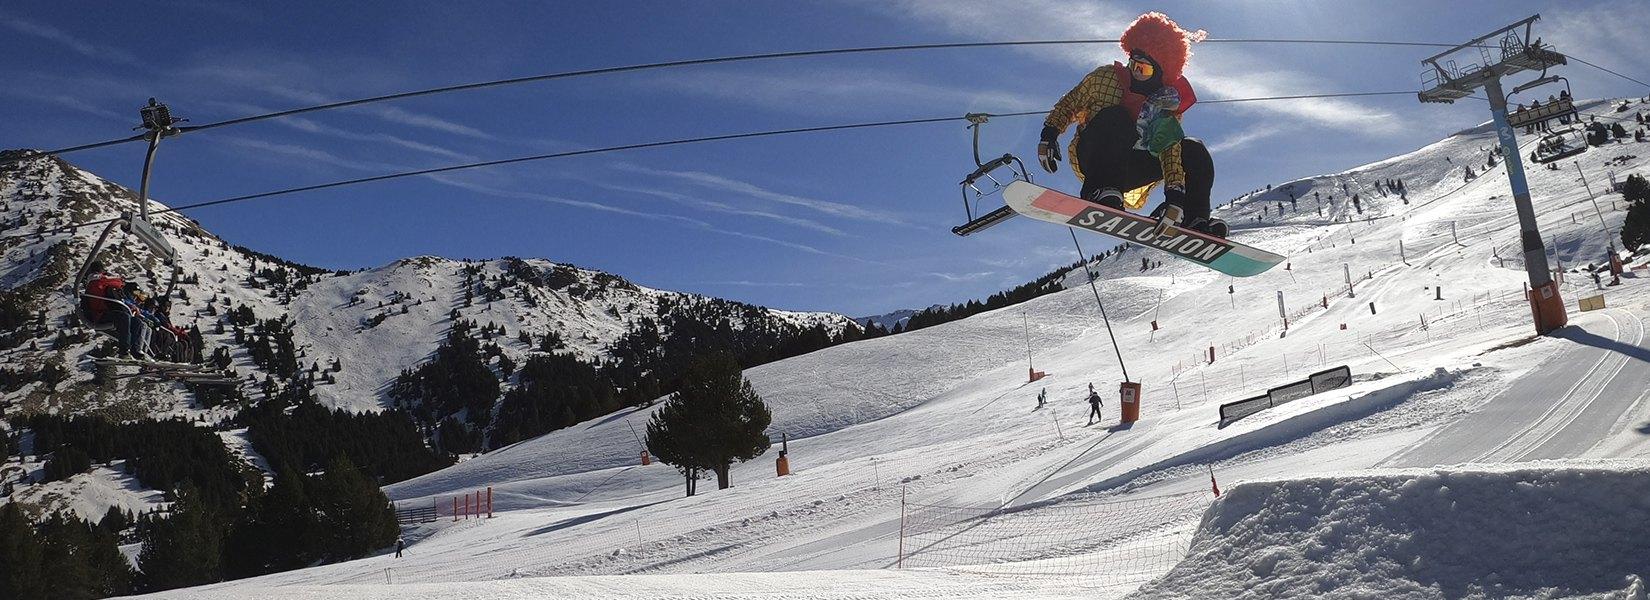 Renew your snowboard equipment